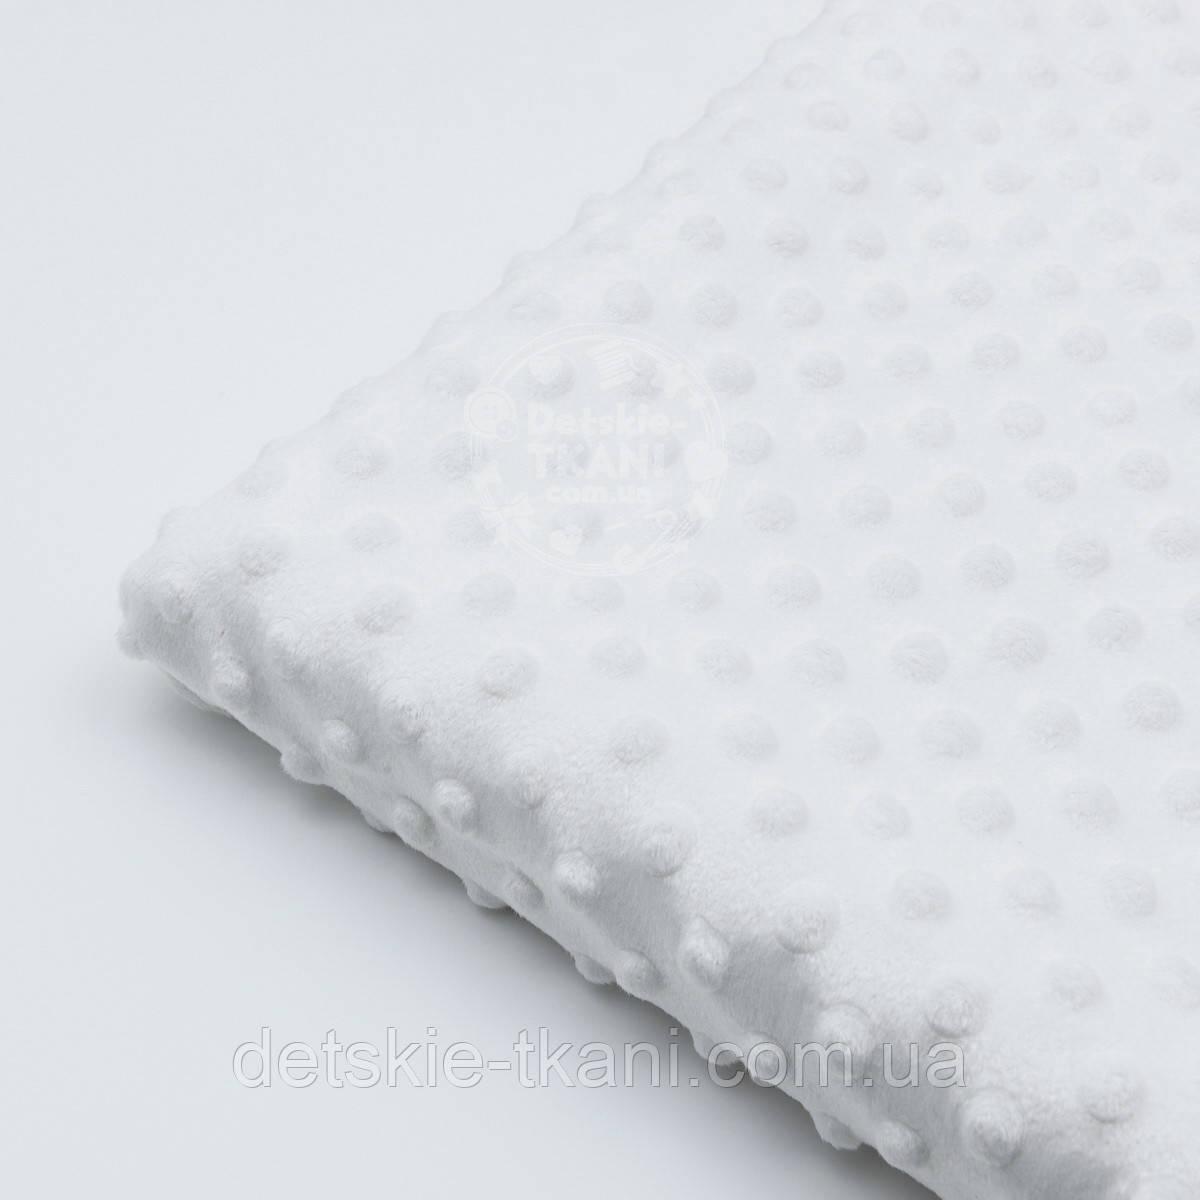 Отрез плюша minky для пледа размером 100*80 см, цвет белый